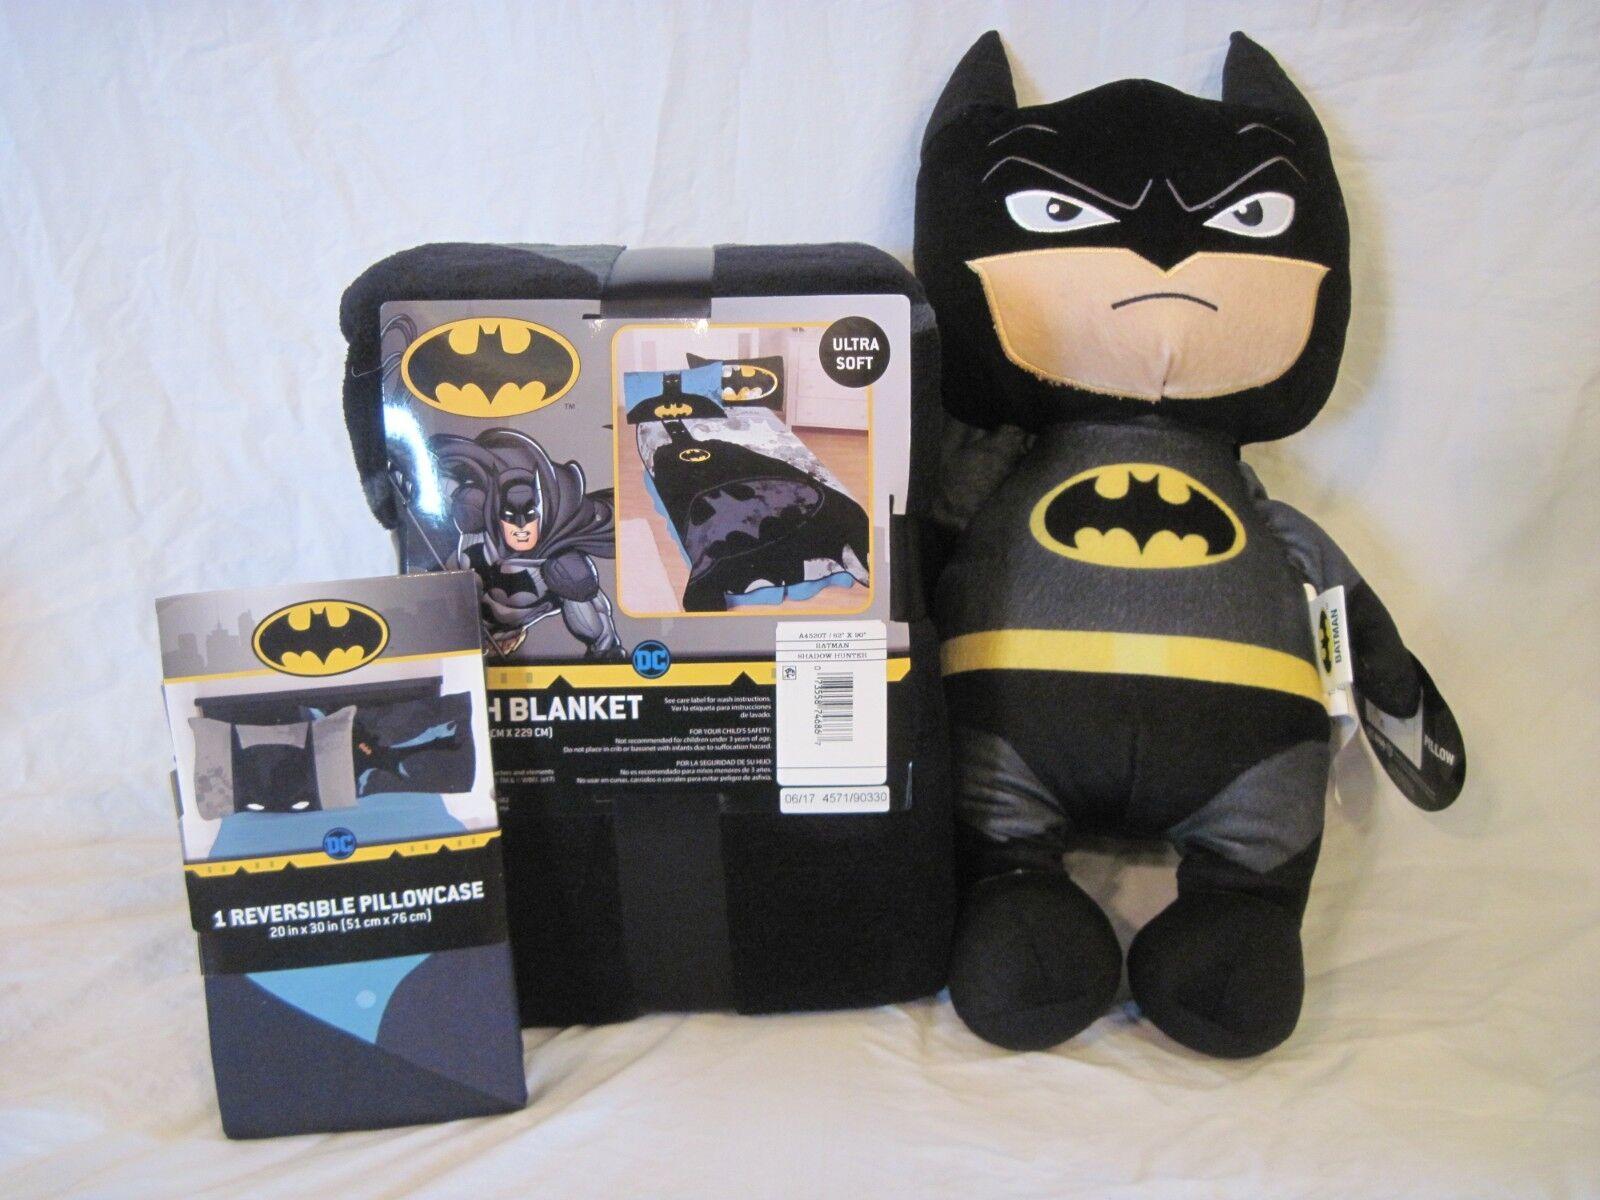 Batman Plush Throw Blanket, taie d'oreiller Chevalier Héros, et oreiller PAL Power Punch